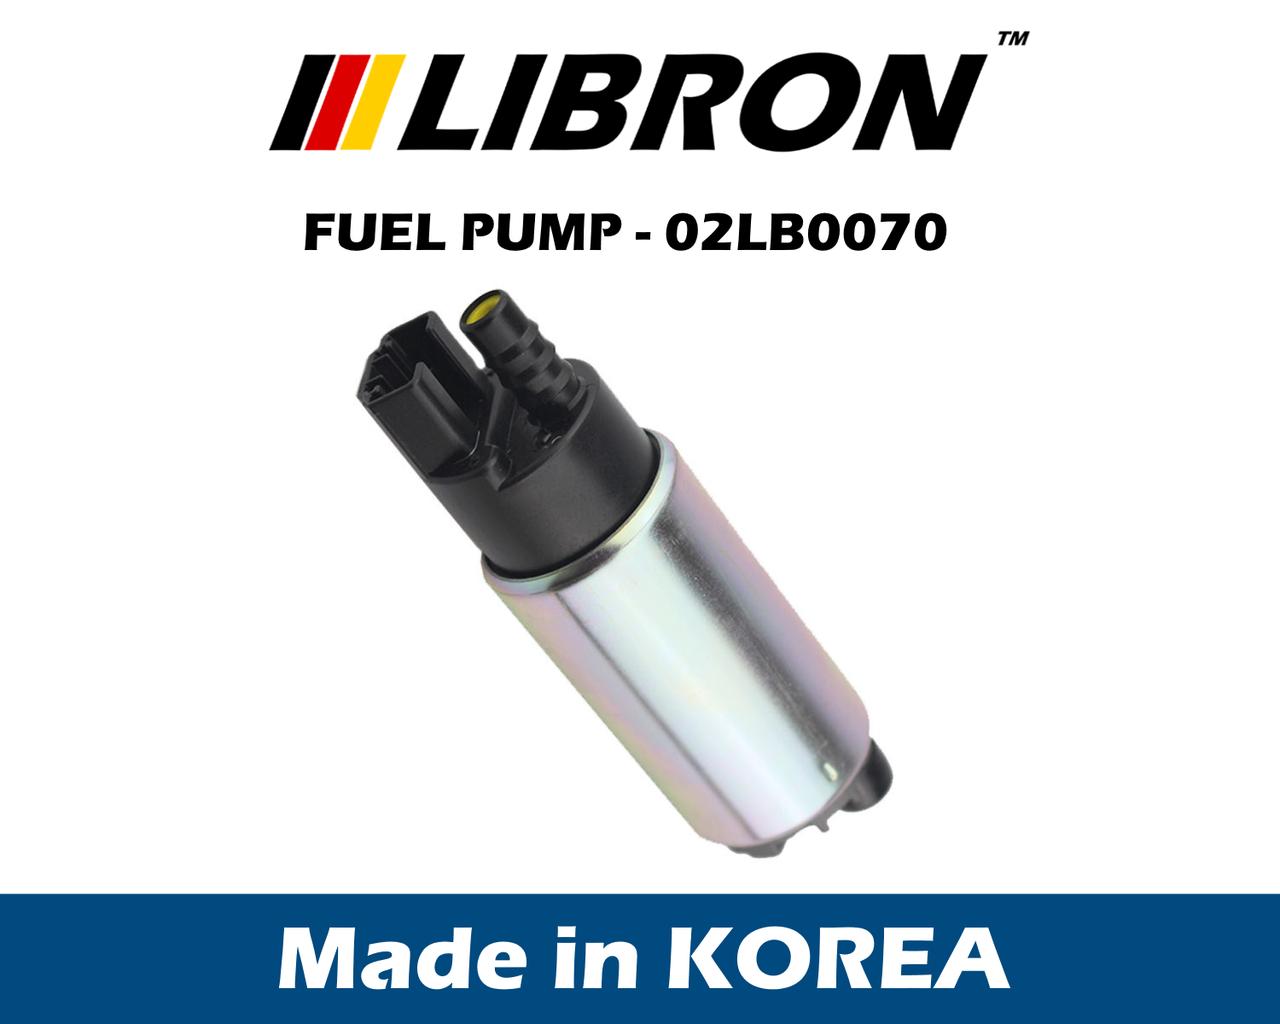 Топливный насос LIBRON 02LB0070 - KIA SPORTAGE (2000-2003)